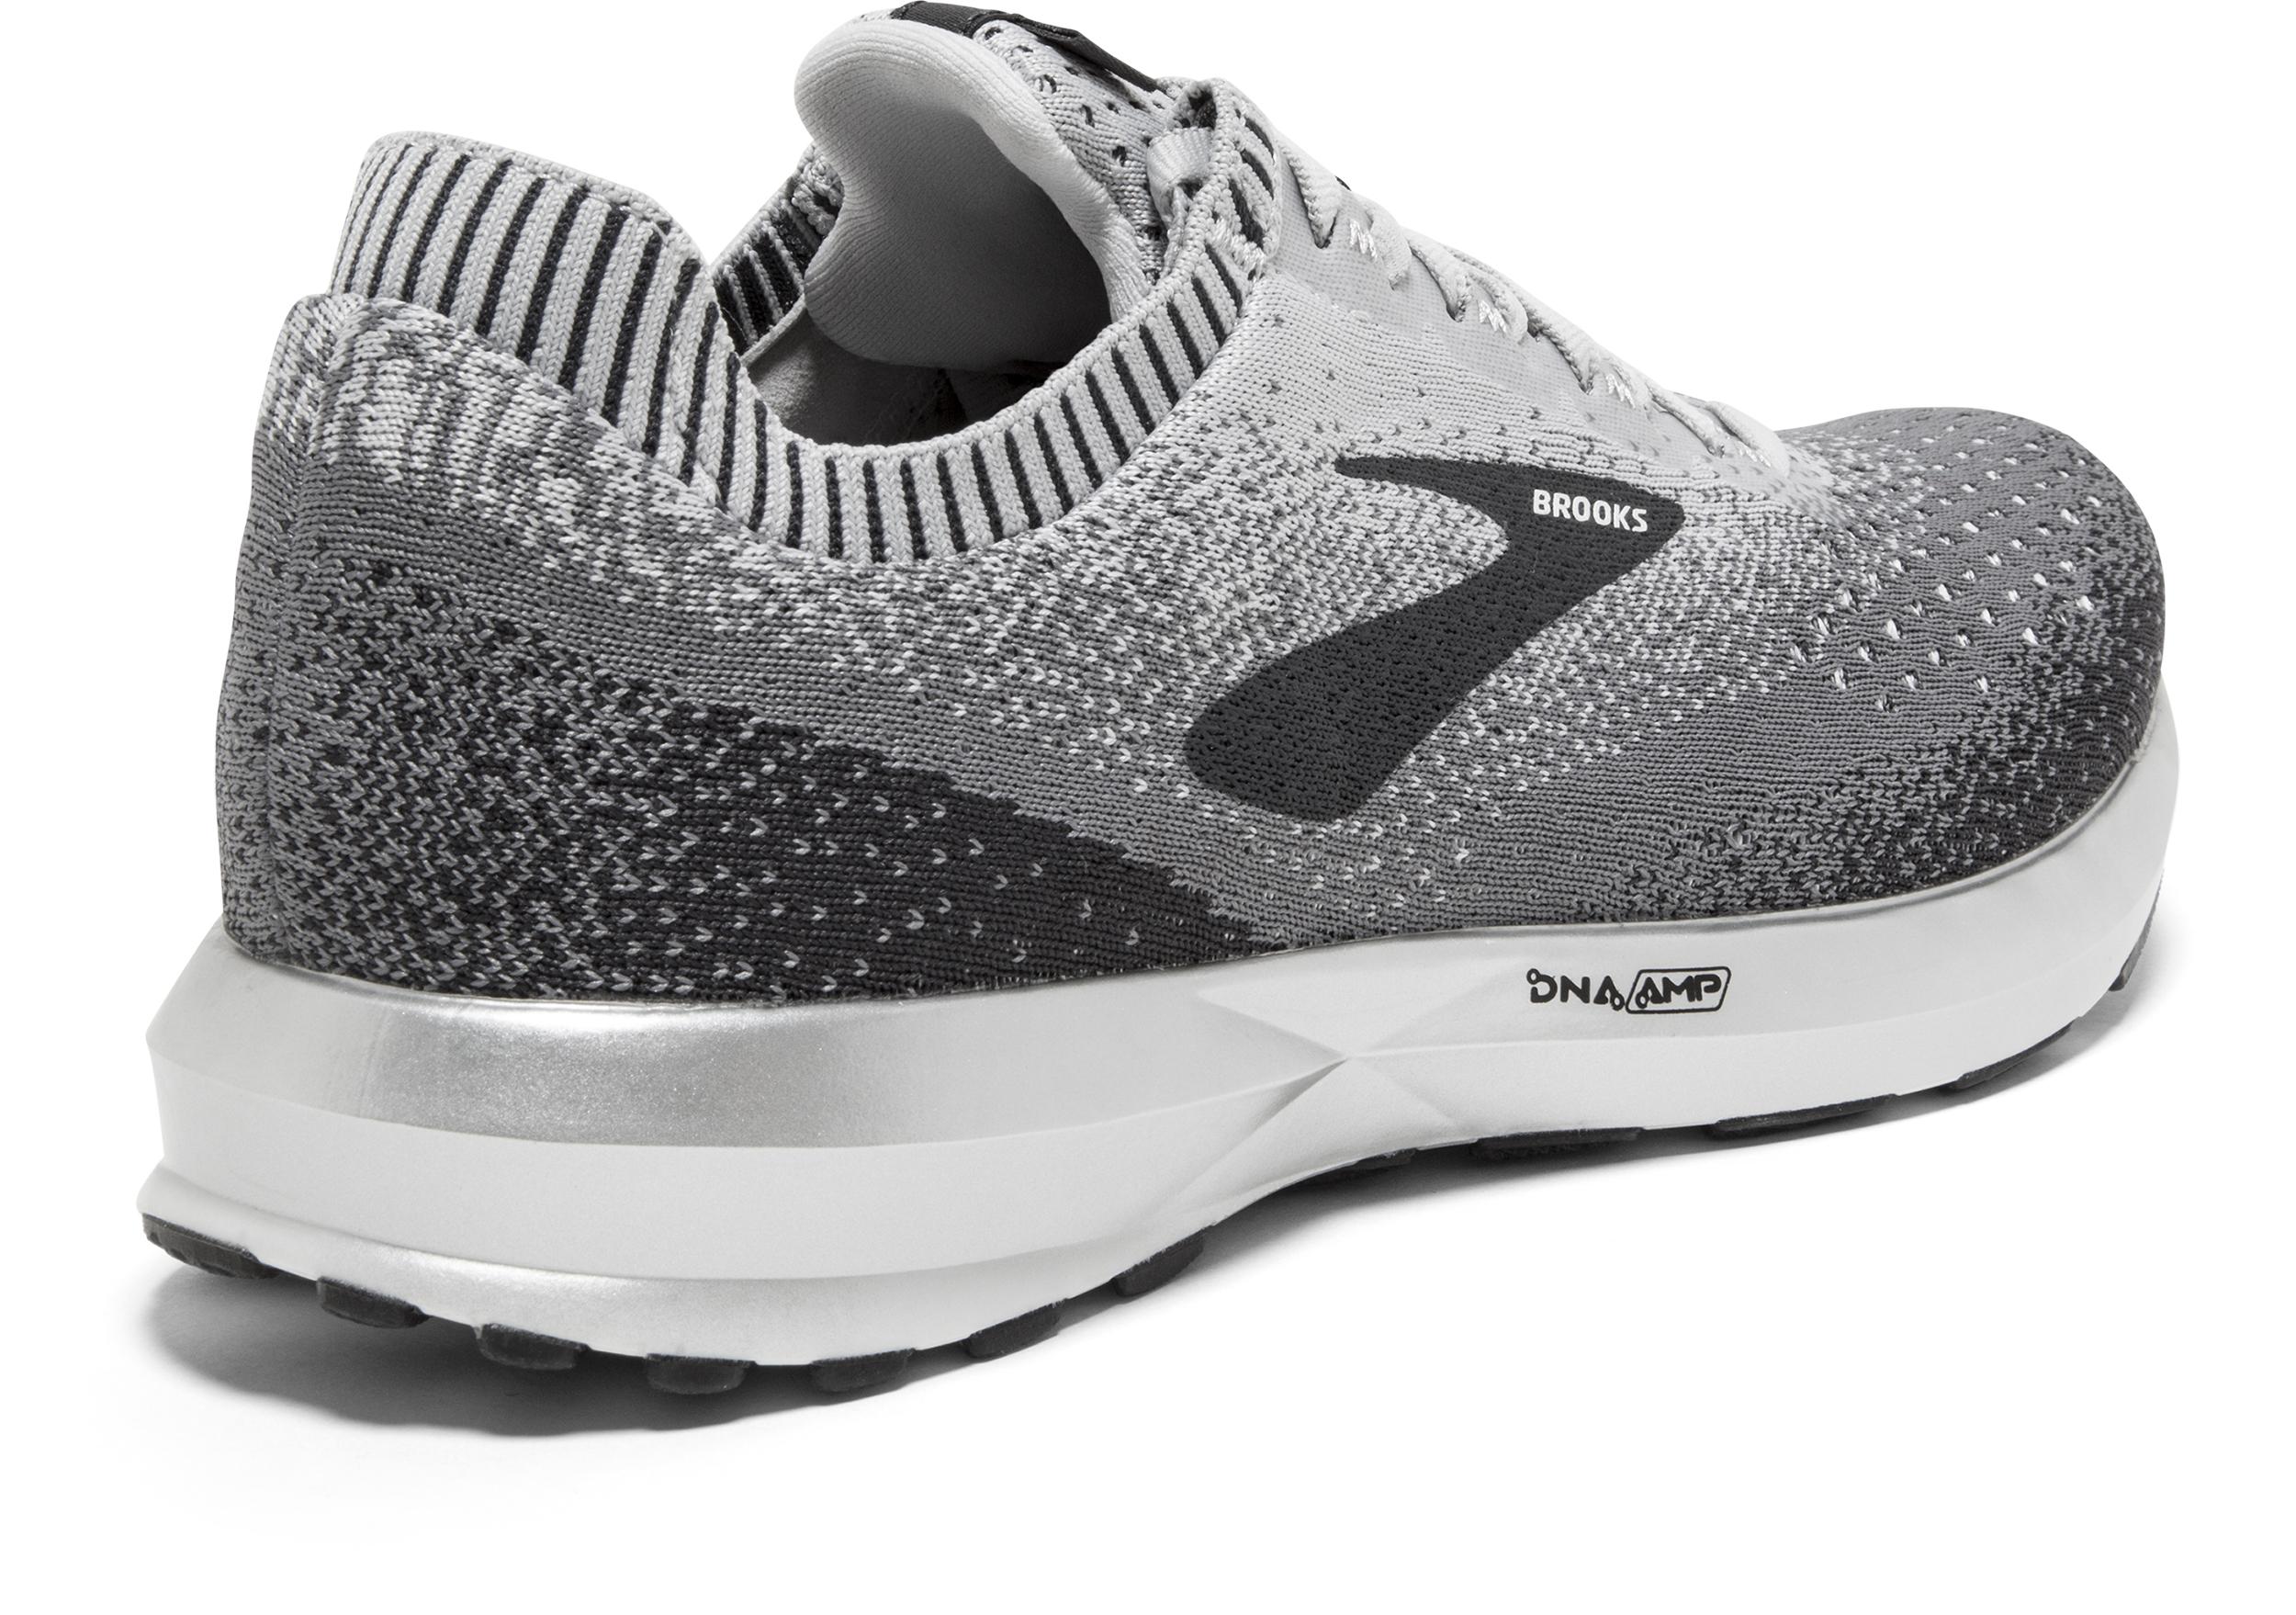 4ffc2efe726 Brooks Levitate 2 Road Running Shoes - Women s